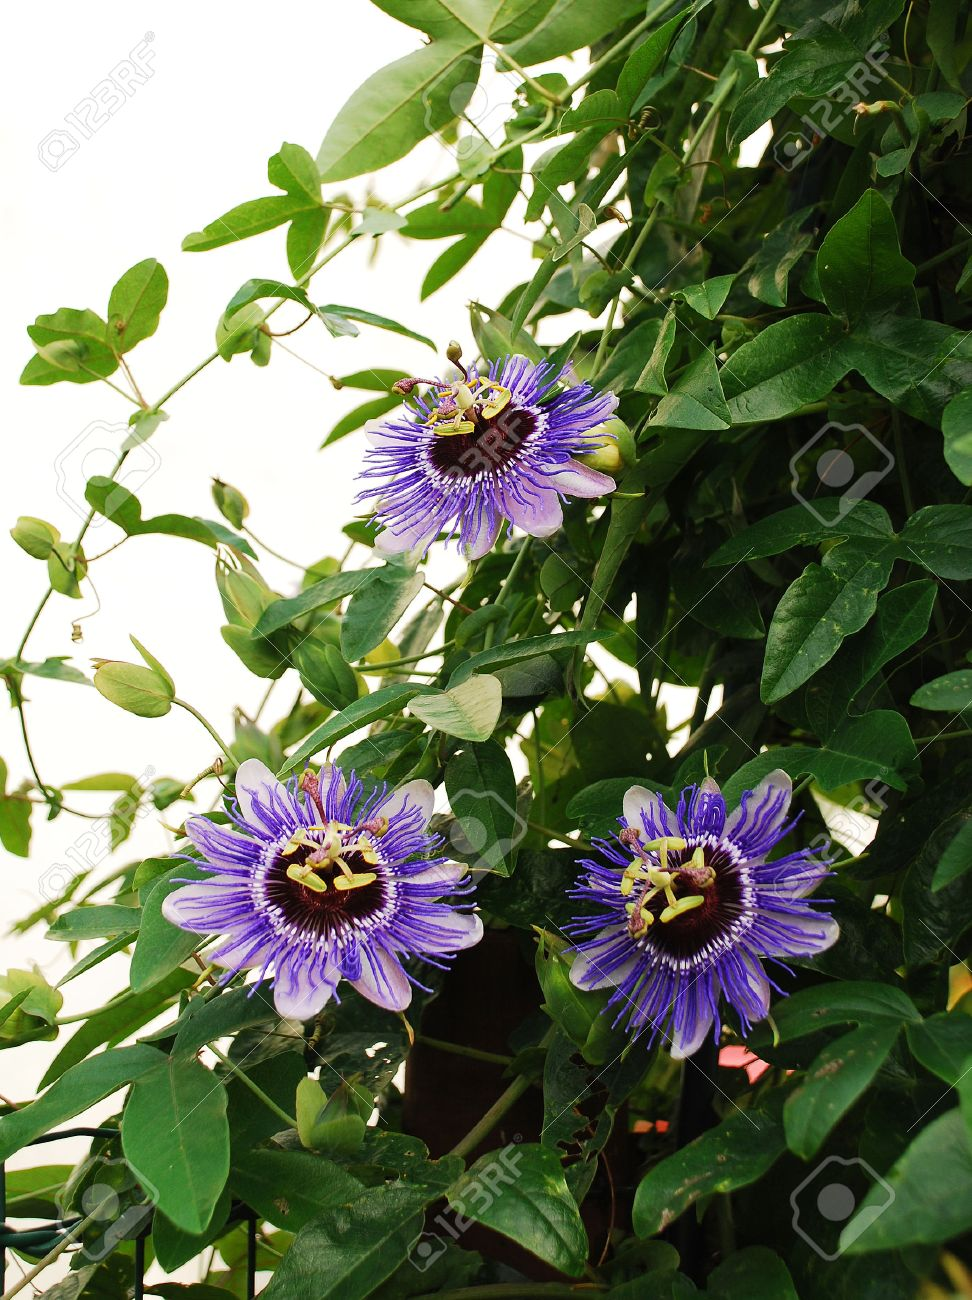 Three Purple Haze Passiflora Flower An Evergreen Tendril Climbing